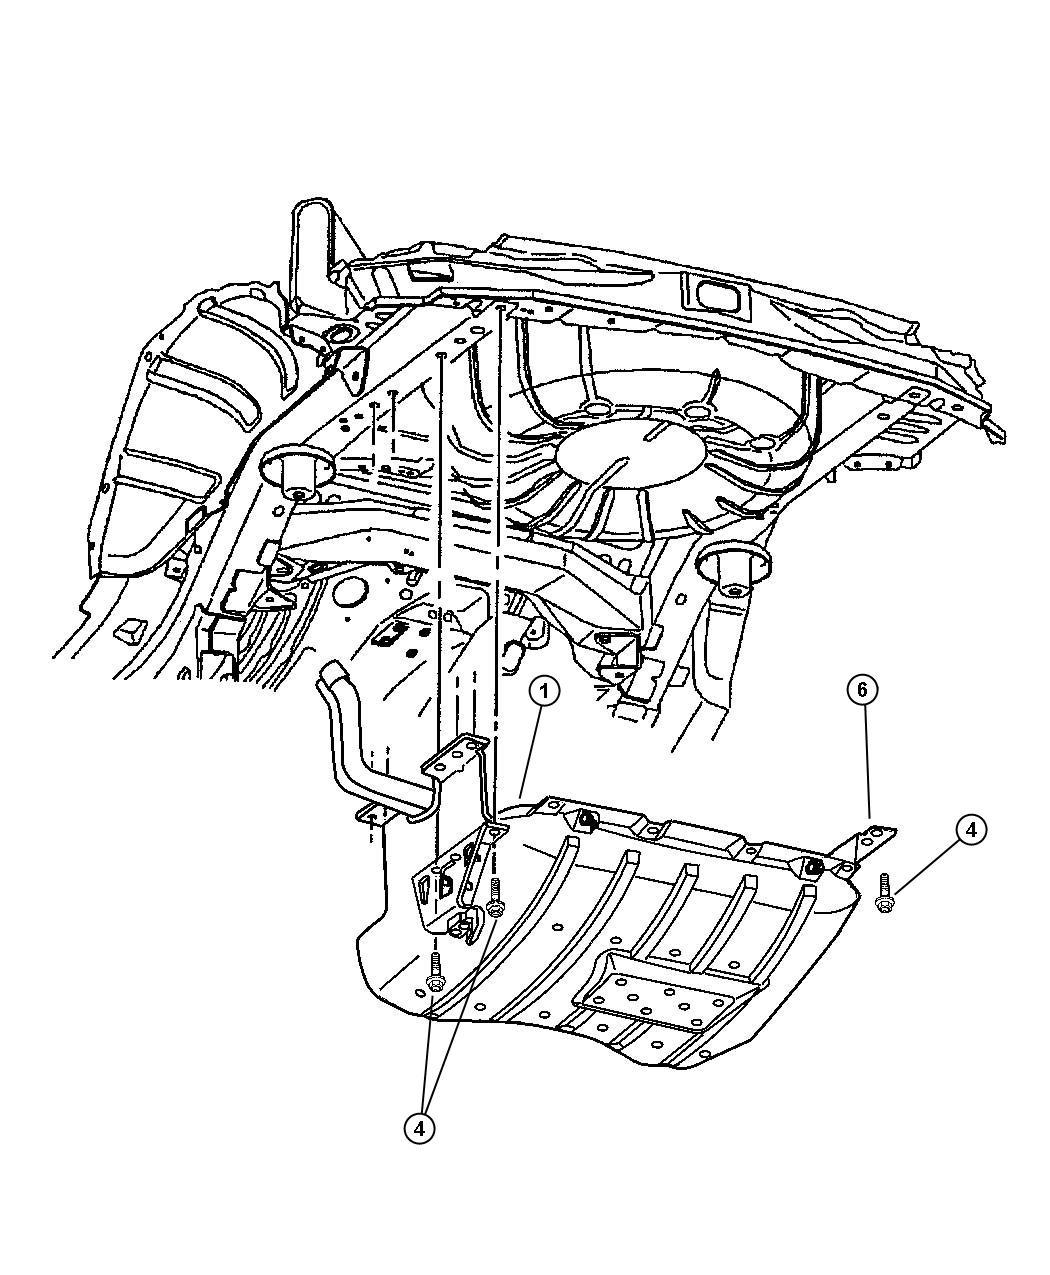 2000 Jeep Grand Cherokee Shield. Fuel tank. Evc, evaerhexa